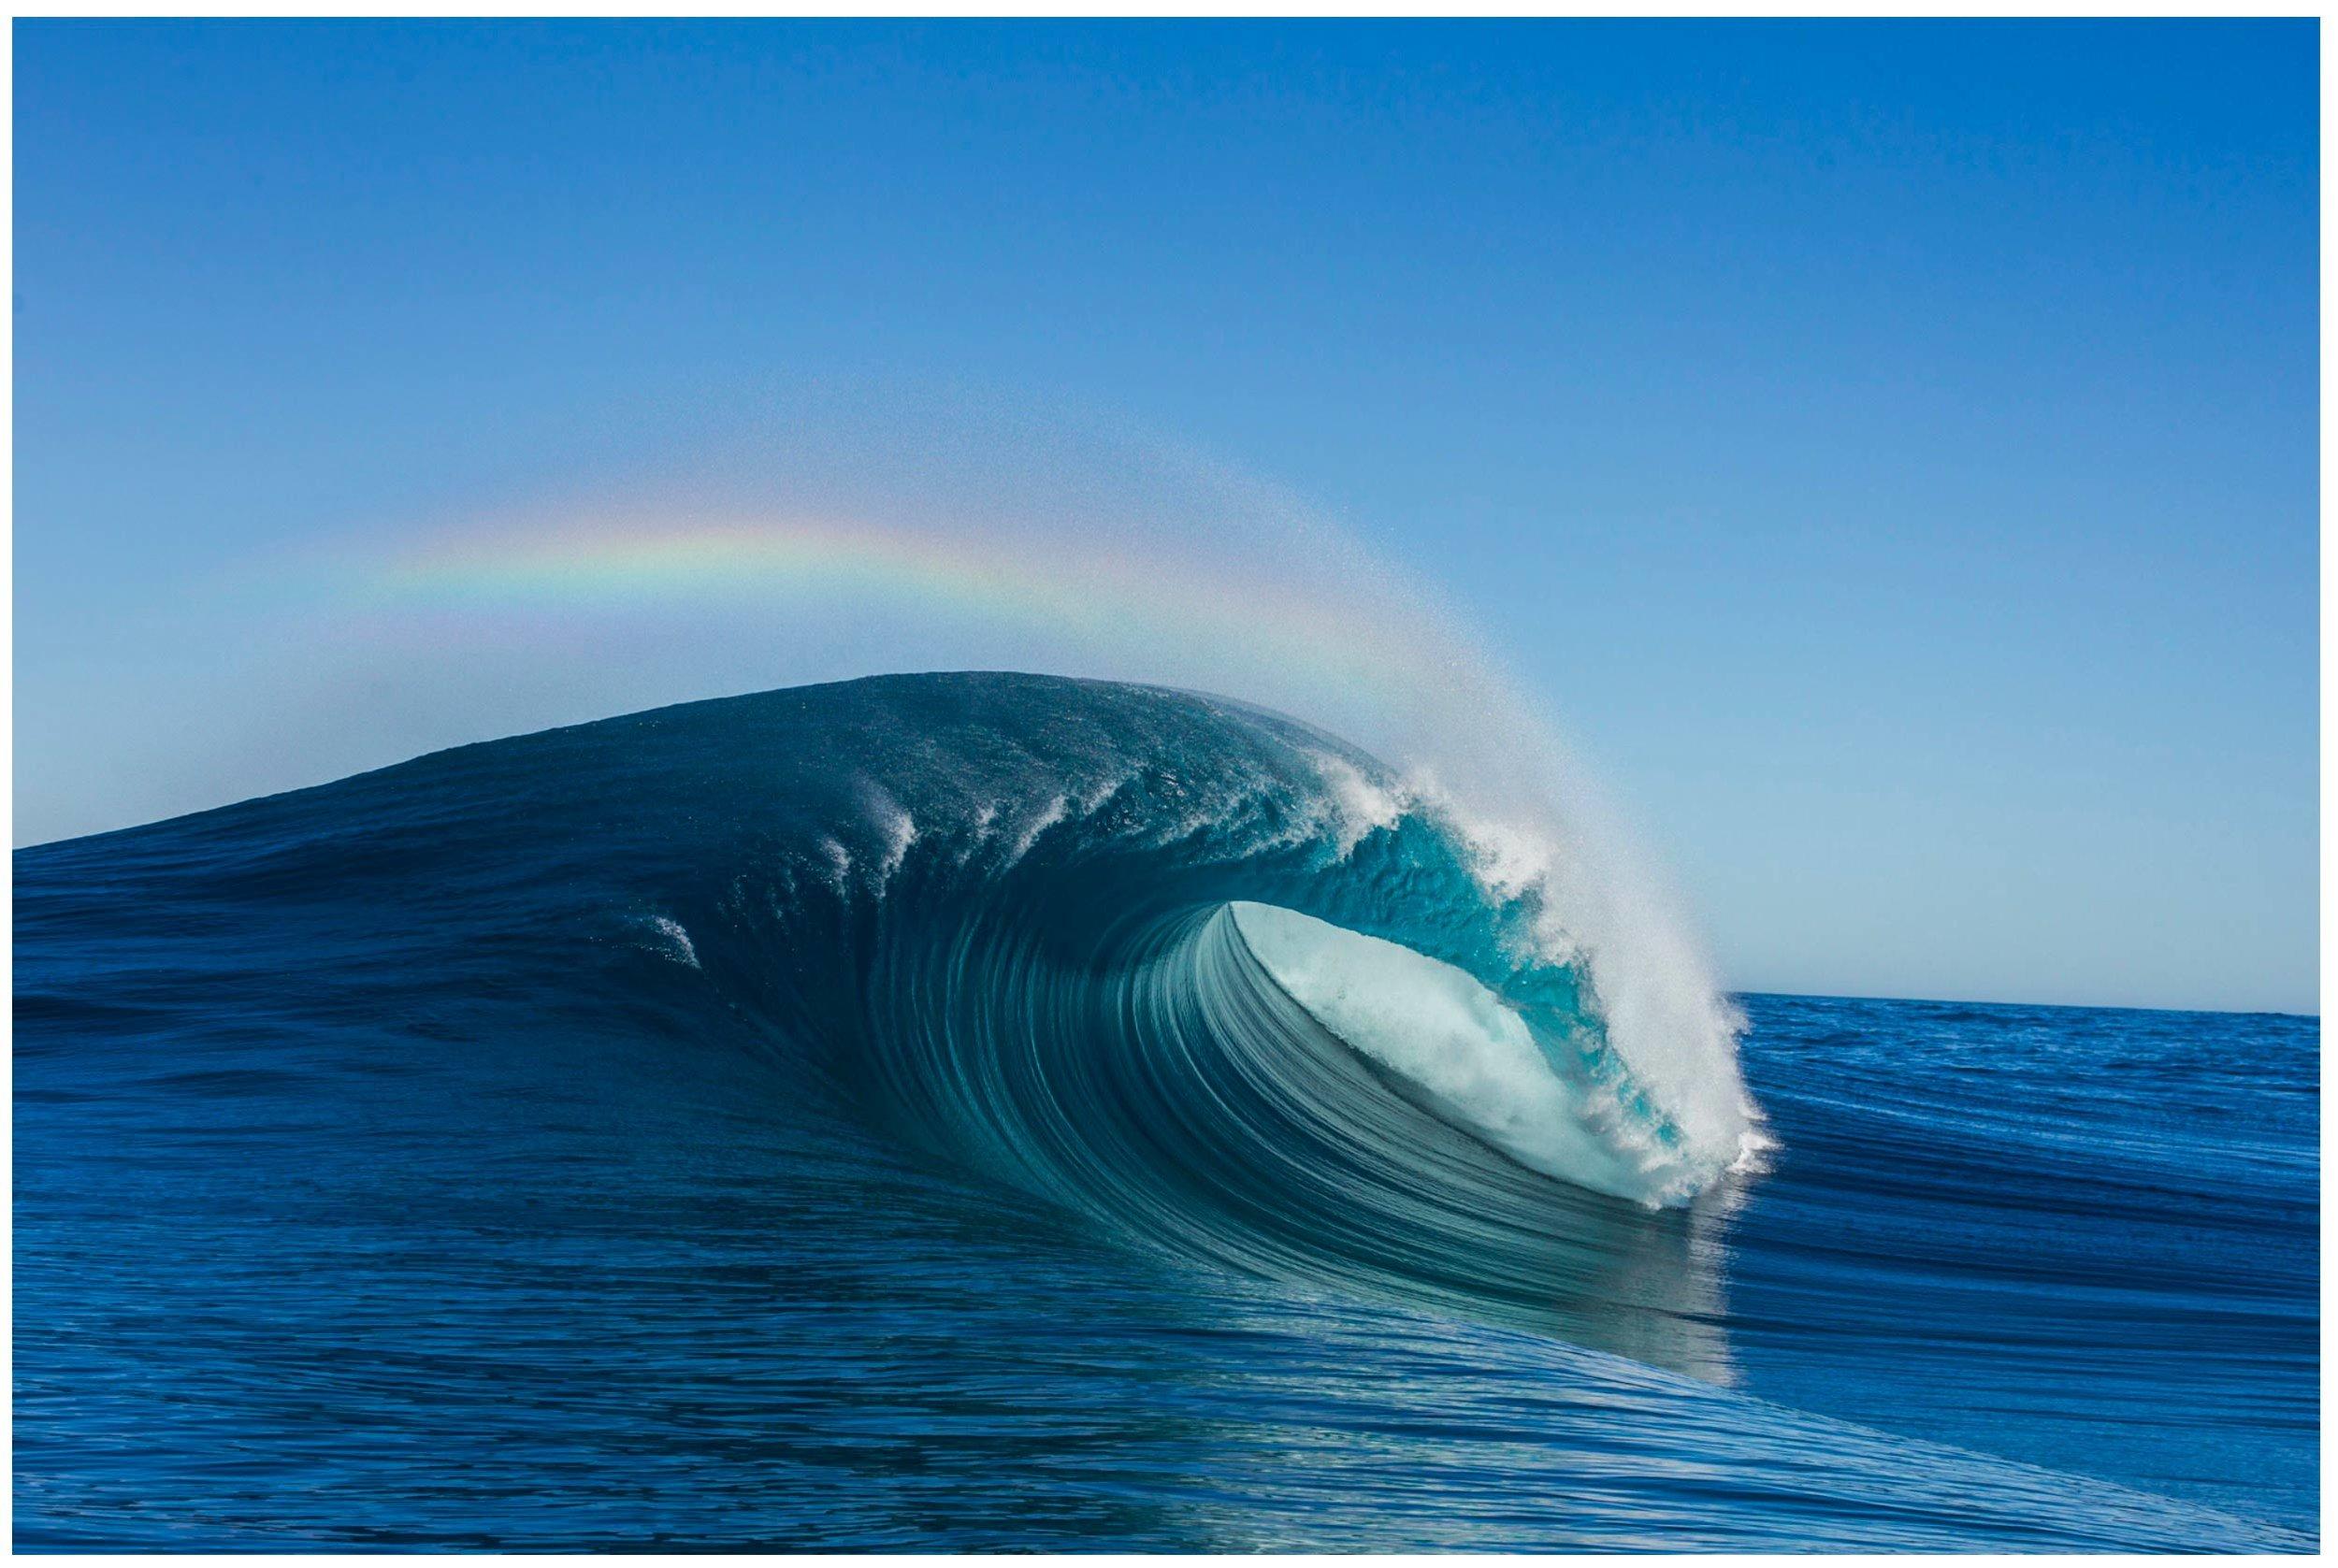 rodd-owen-ocean-surf-photography-for-sale-136.jpg